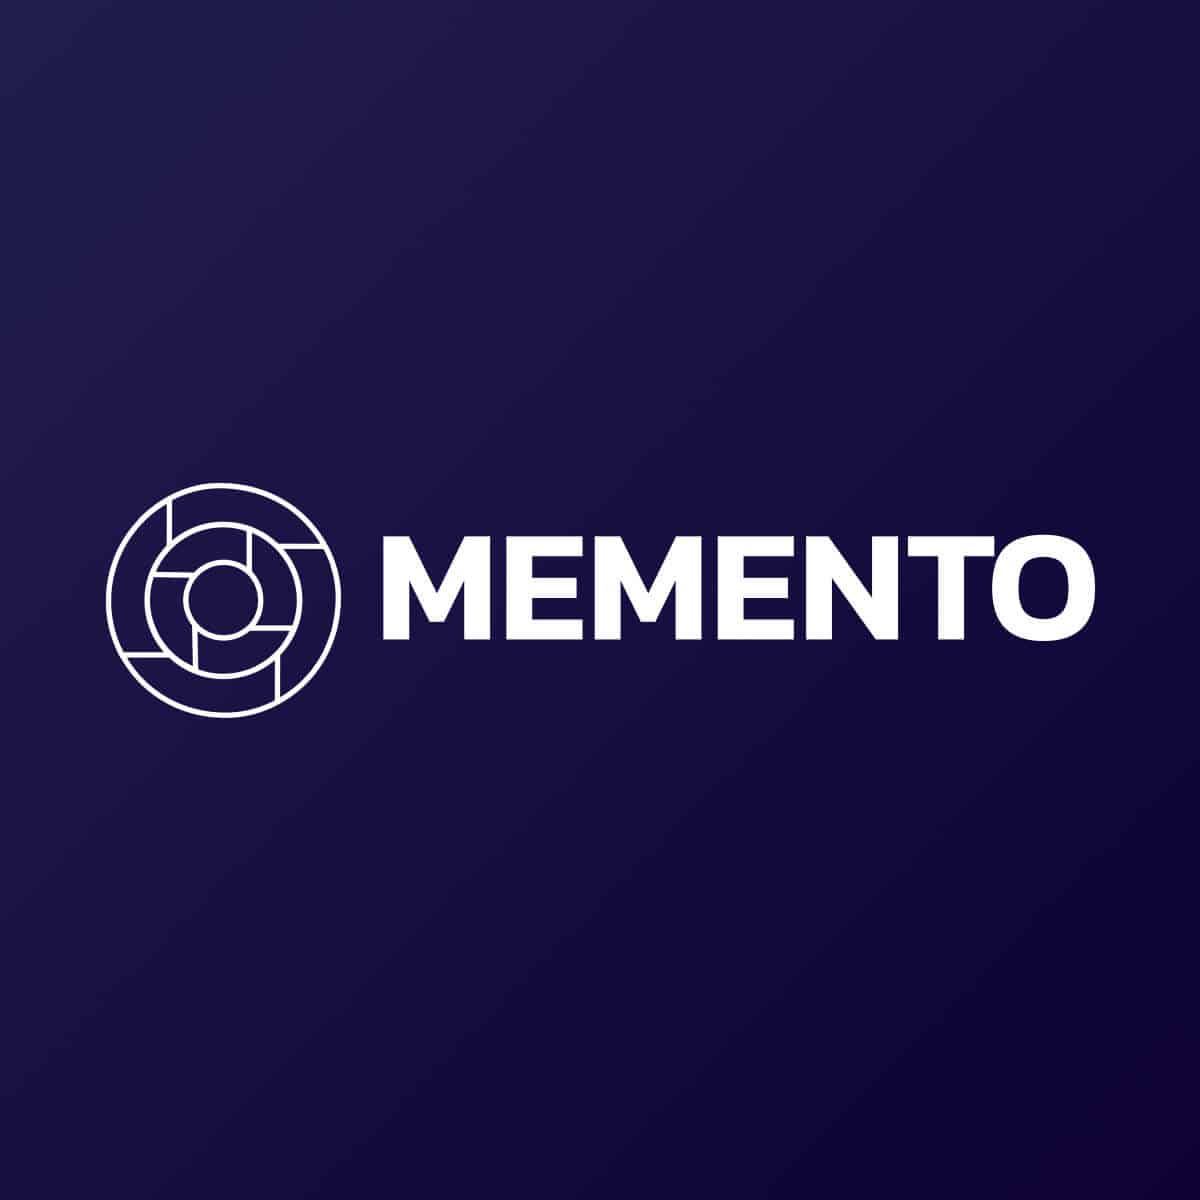 Memento Solution Logo Wacano